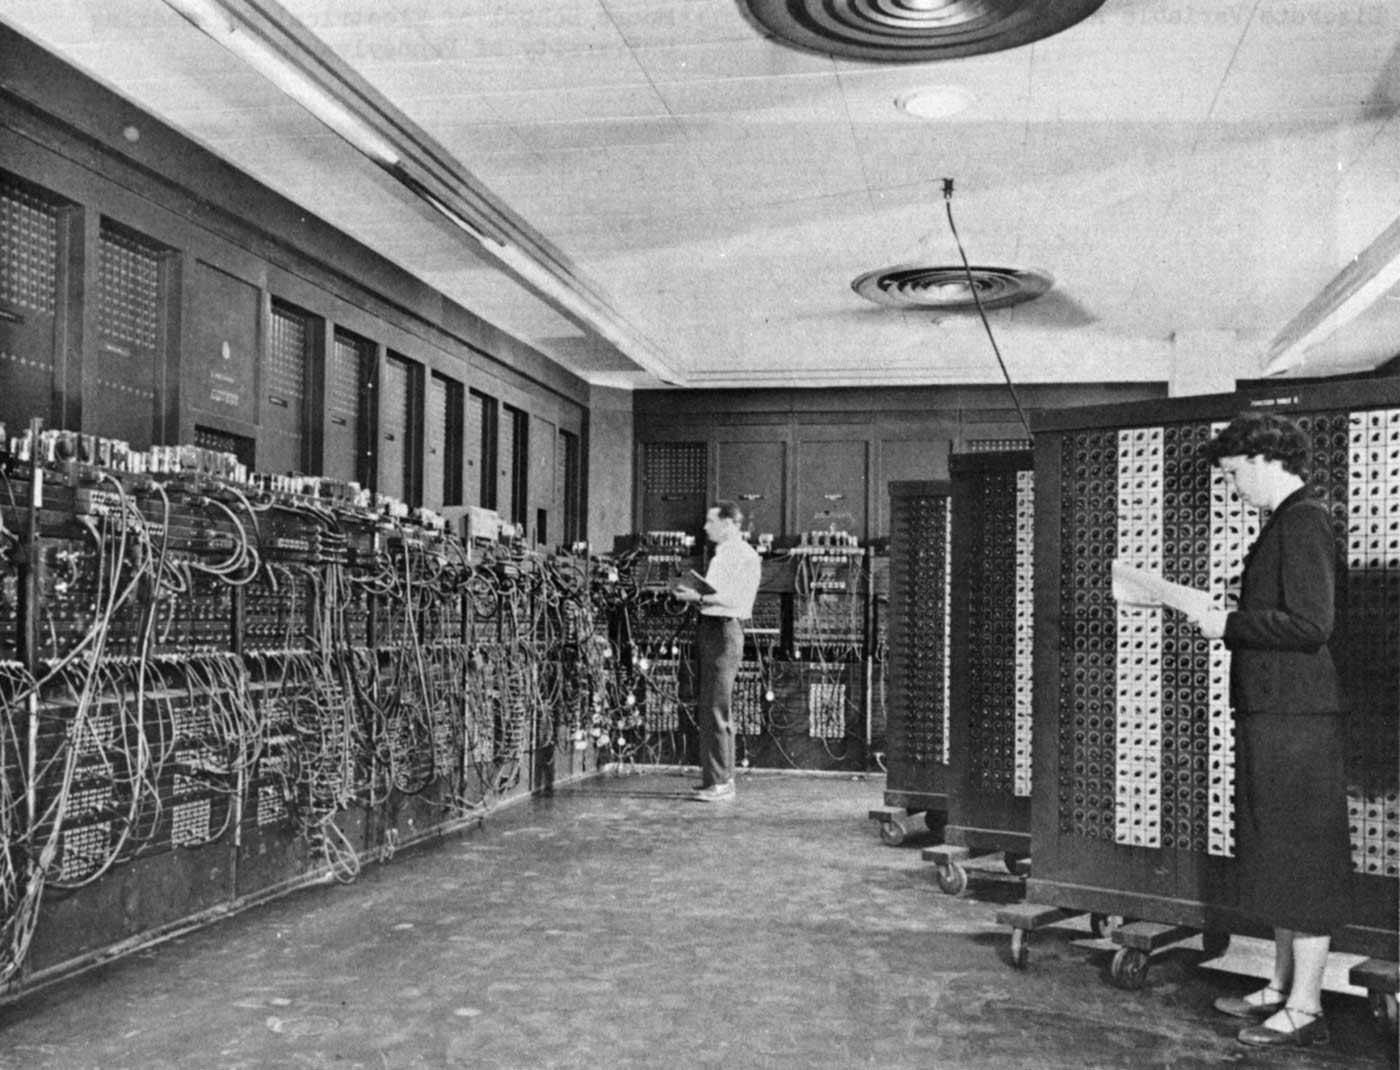 ENIAC (Electronic Numerical Integrator And Computer) in Philadelphia, Pennsylvania, circa 1947 to 1955.